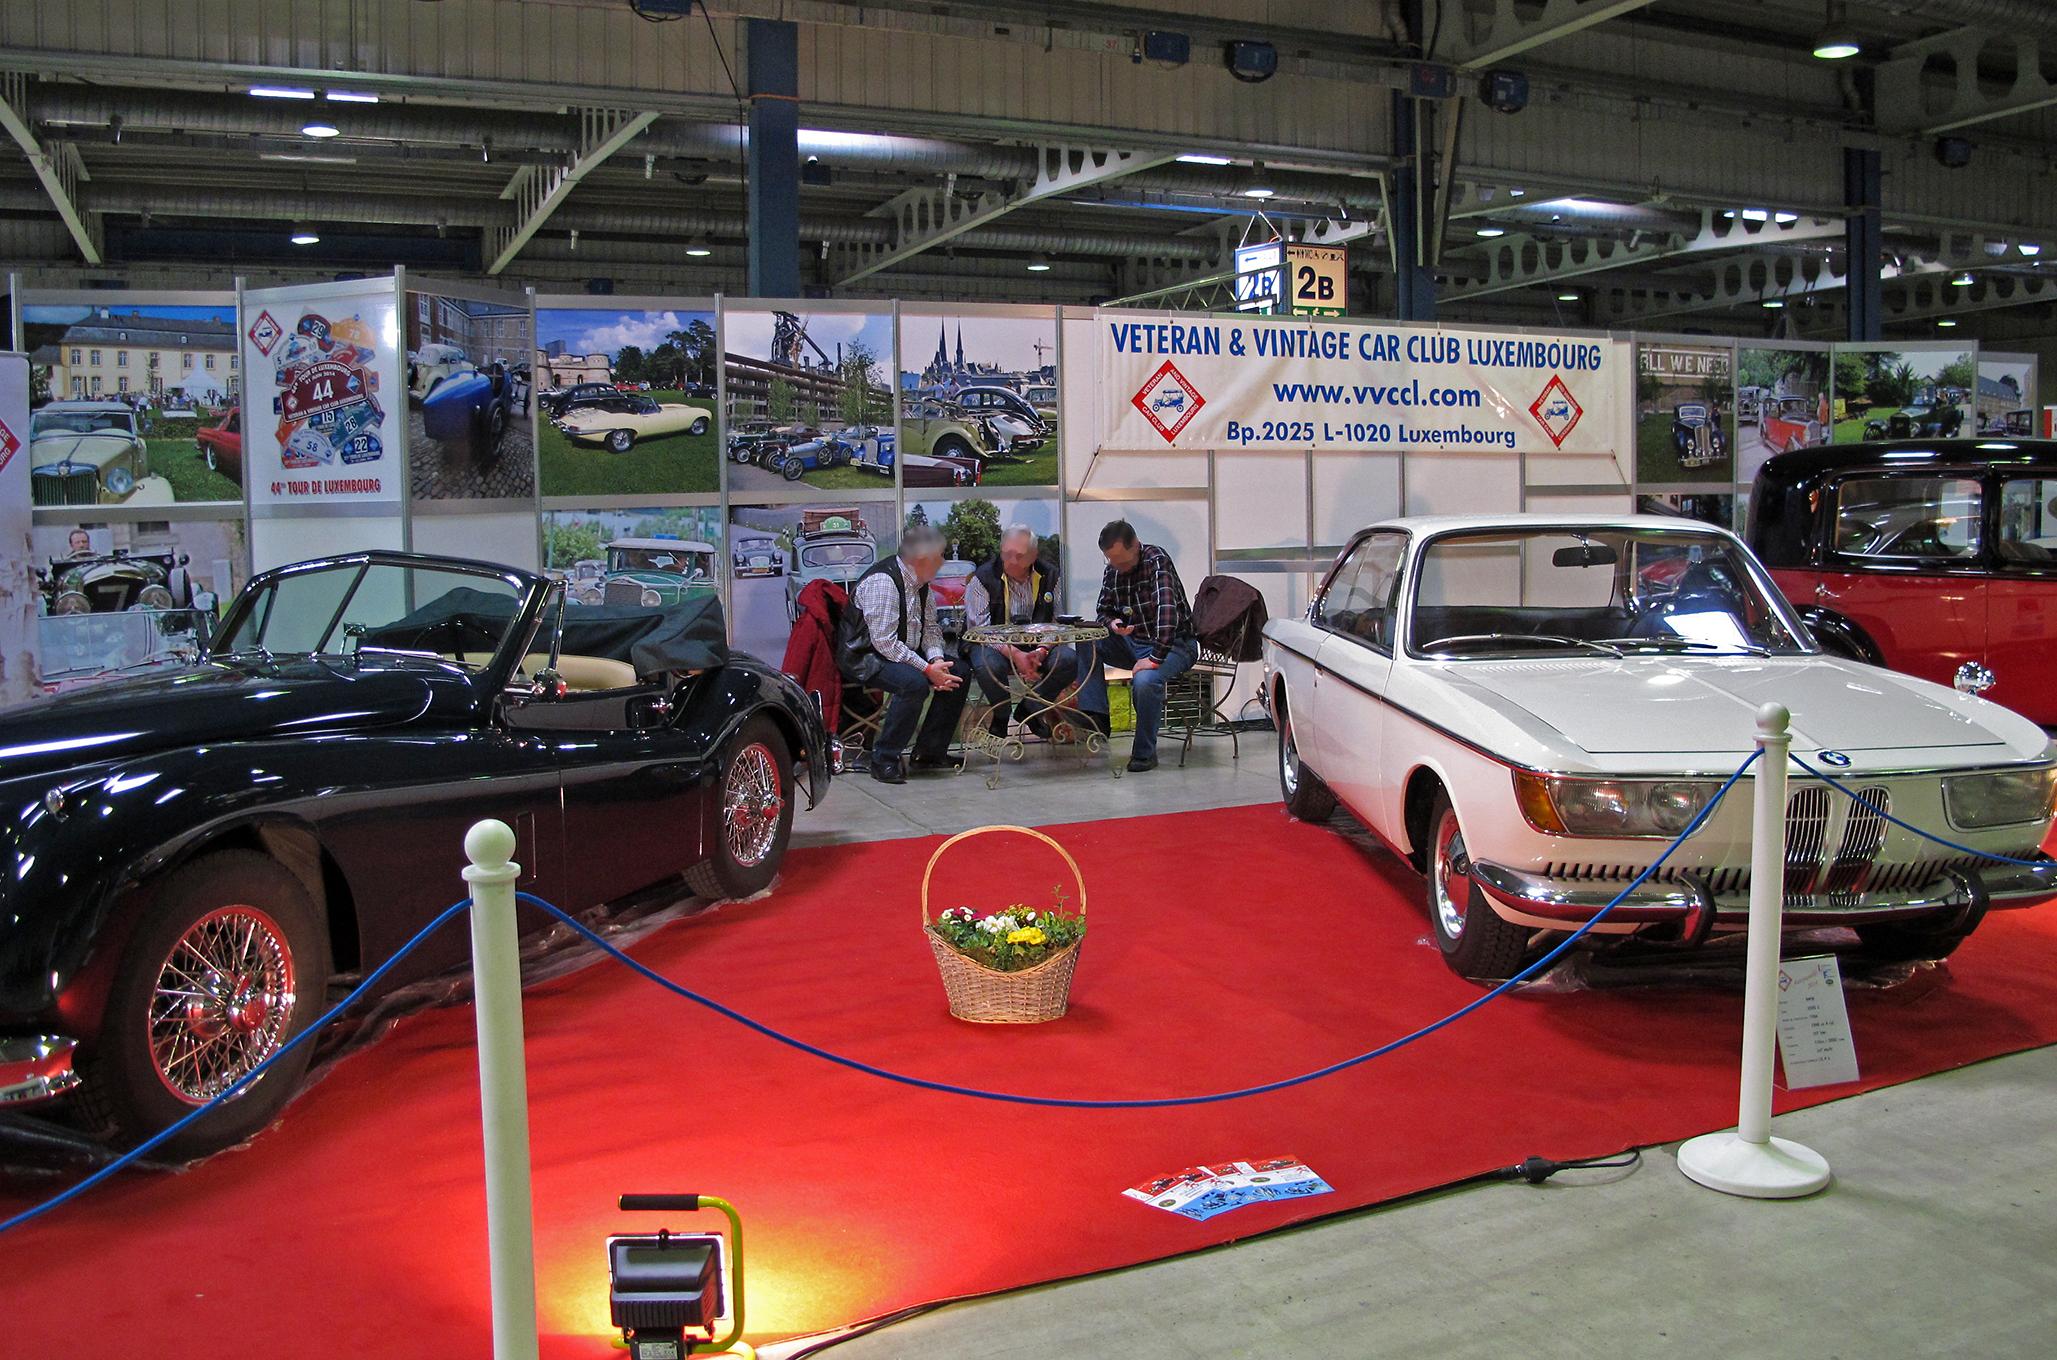 File:Veteran & Vintage Car Club Luxembourg, Autojumble 01.jpg ...